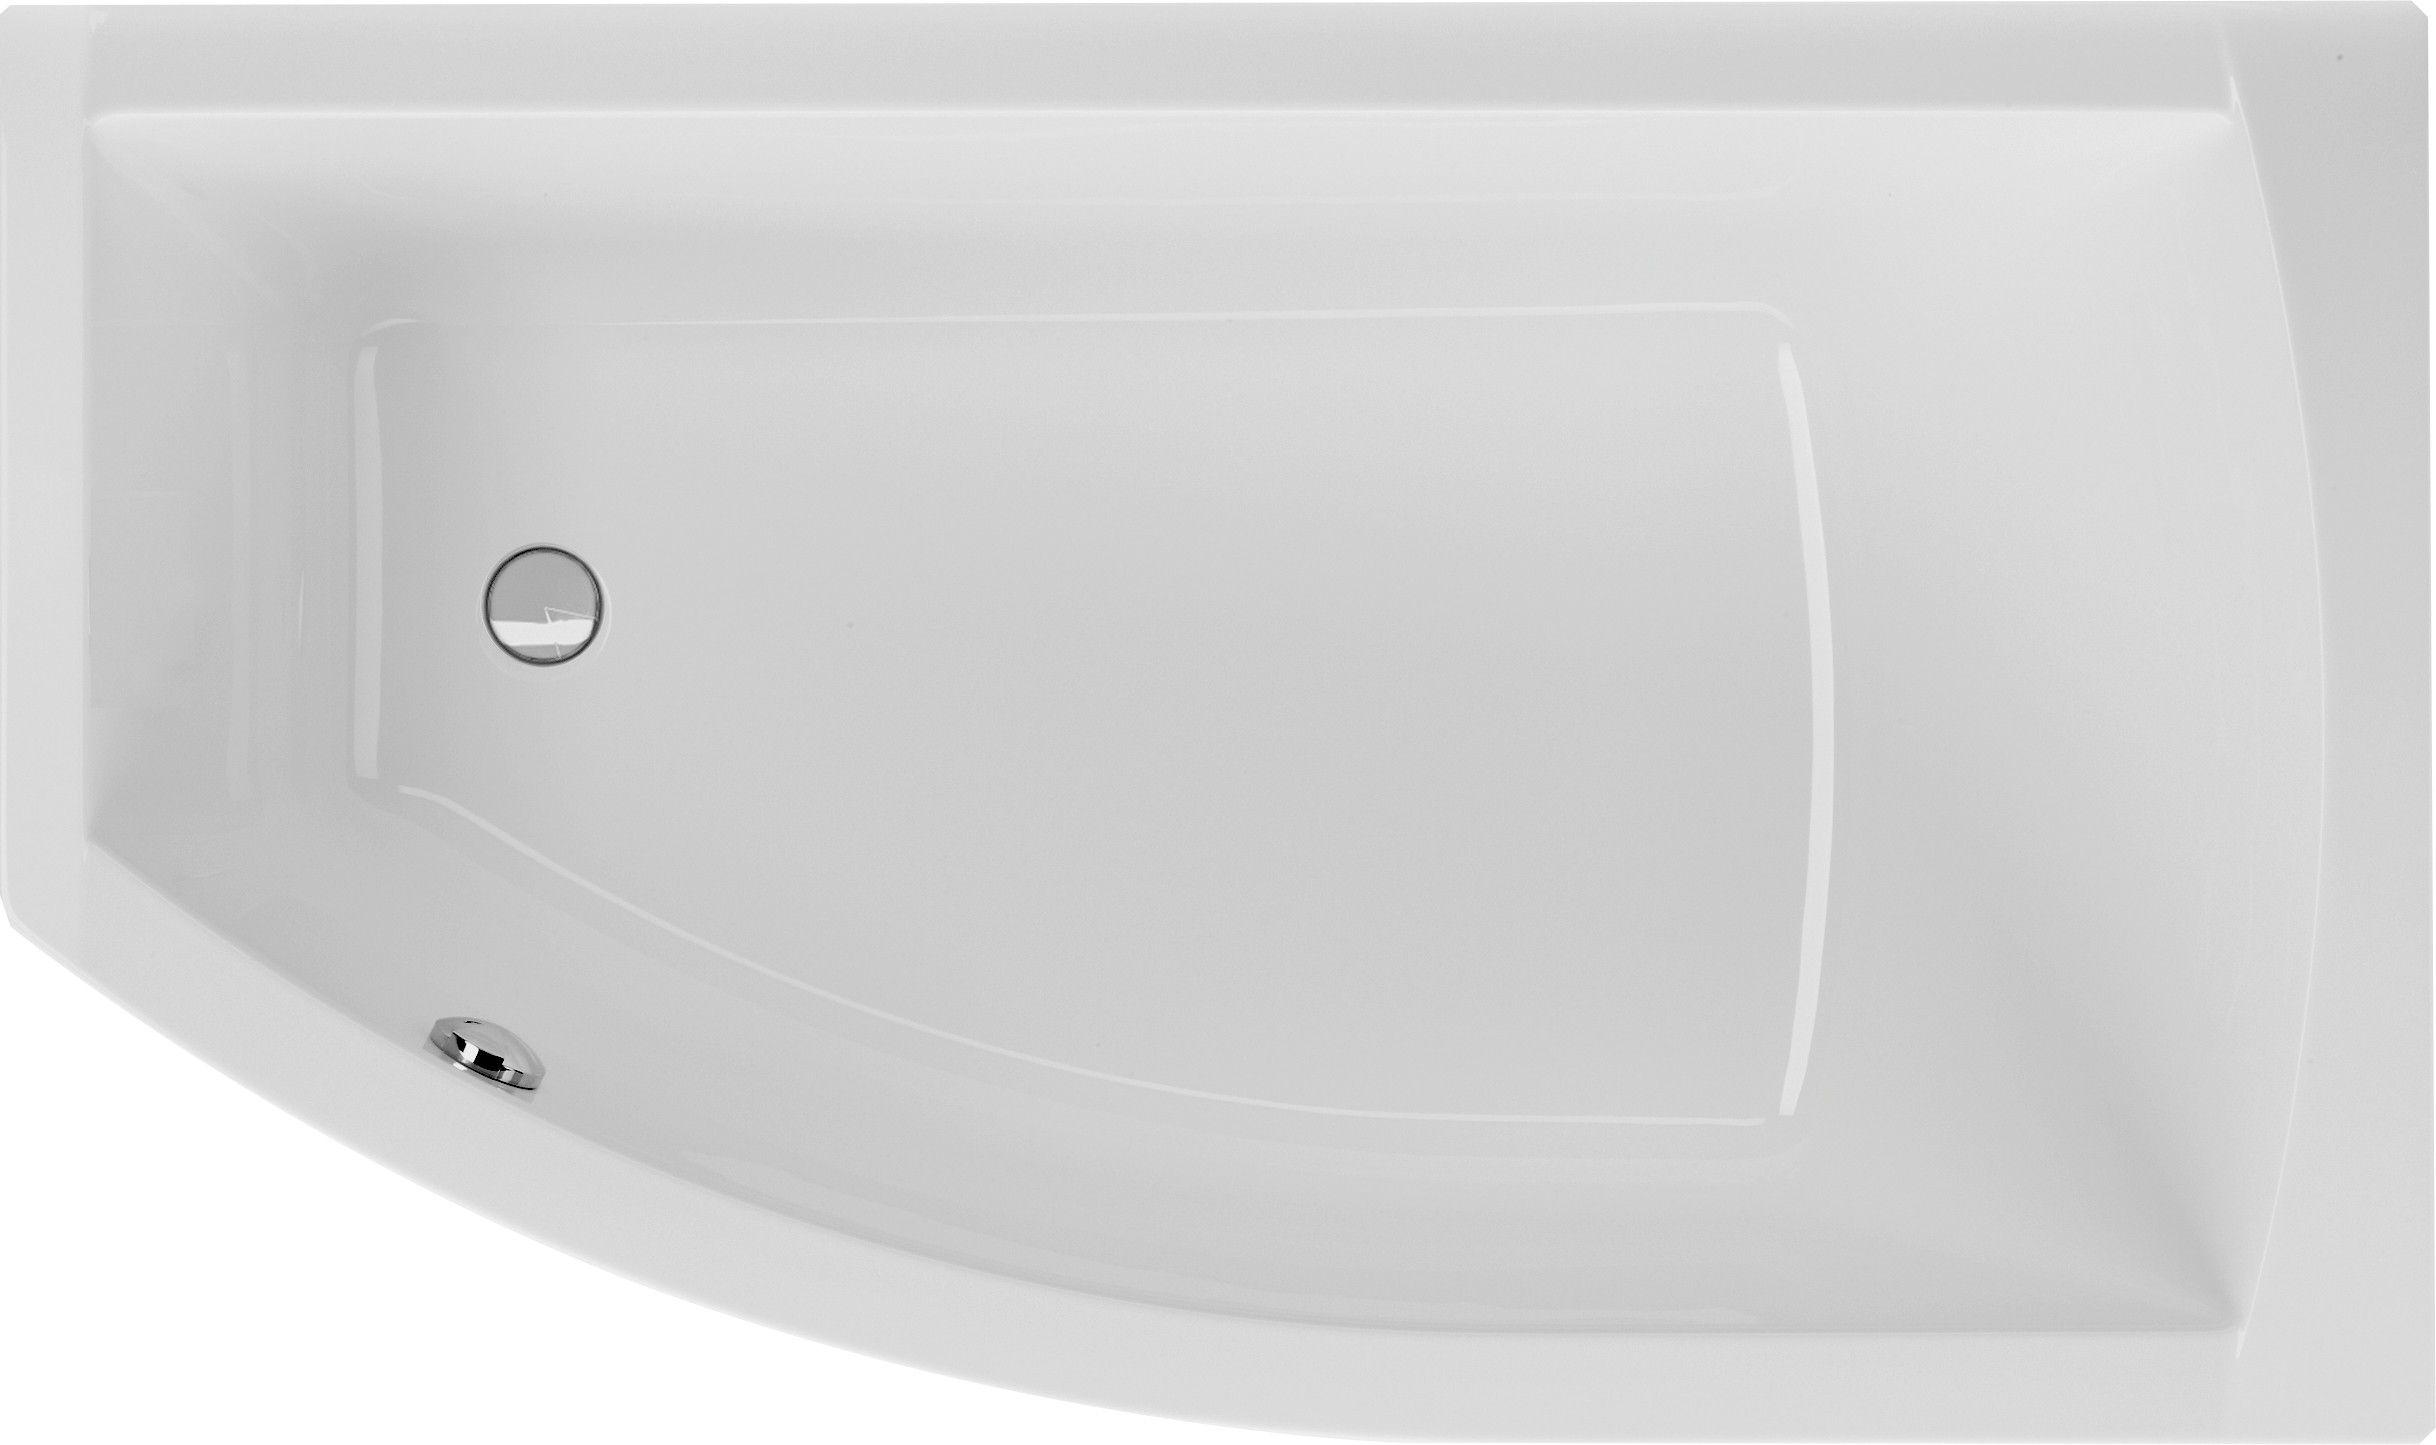 Badewanne Asymmetrisch 160 X 95 X 45 5 Cm Badewanne Badewanne Raumsparwanne Raumsparwanne 160 Badewanne Raumsparwanne Wanne